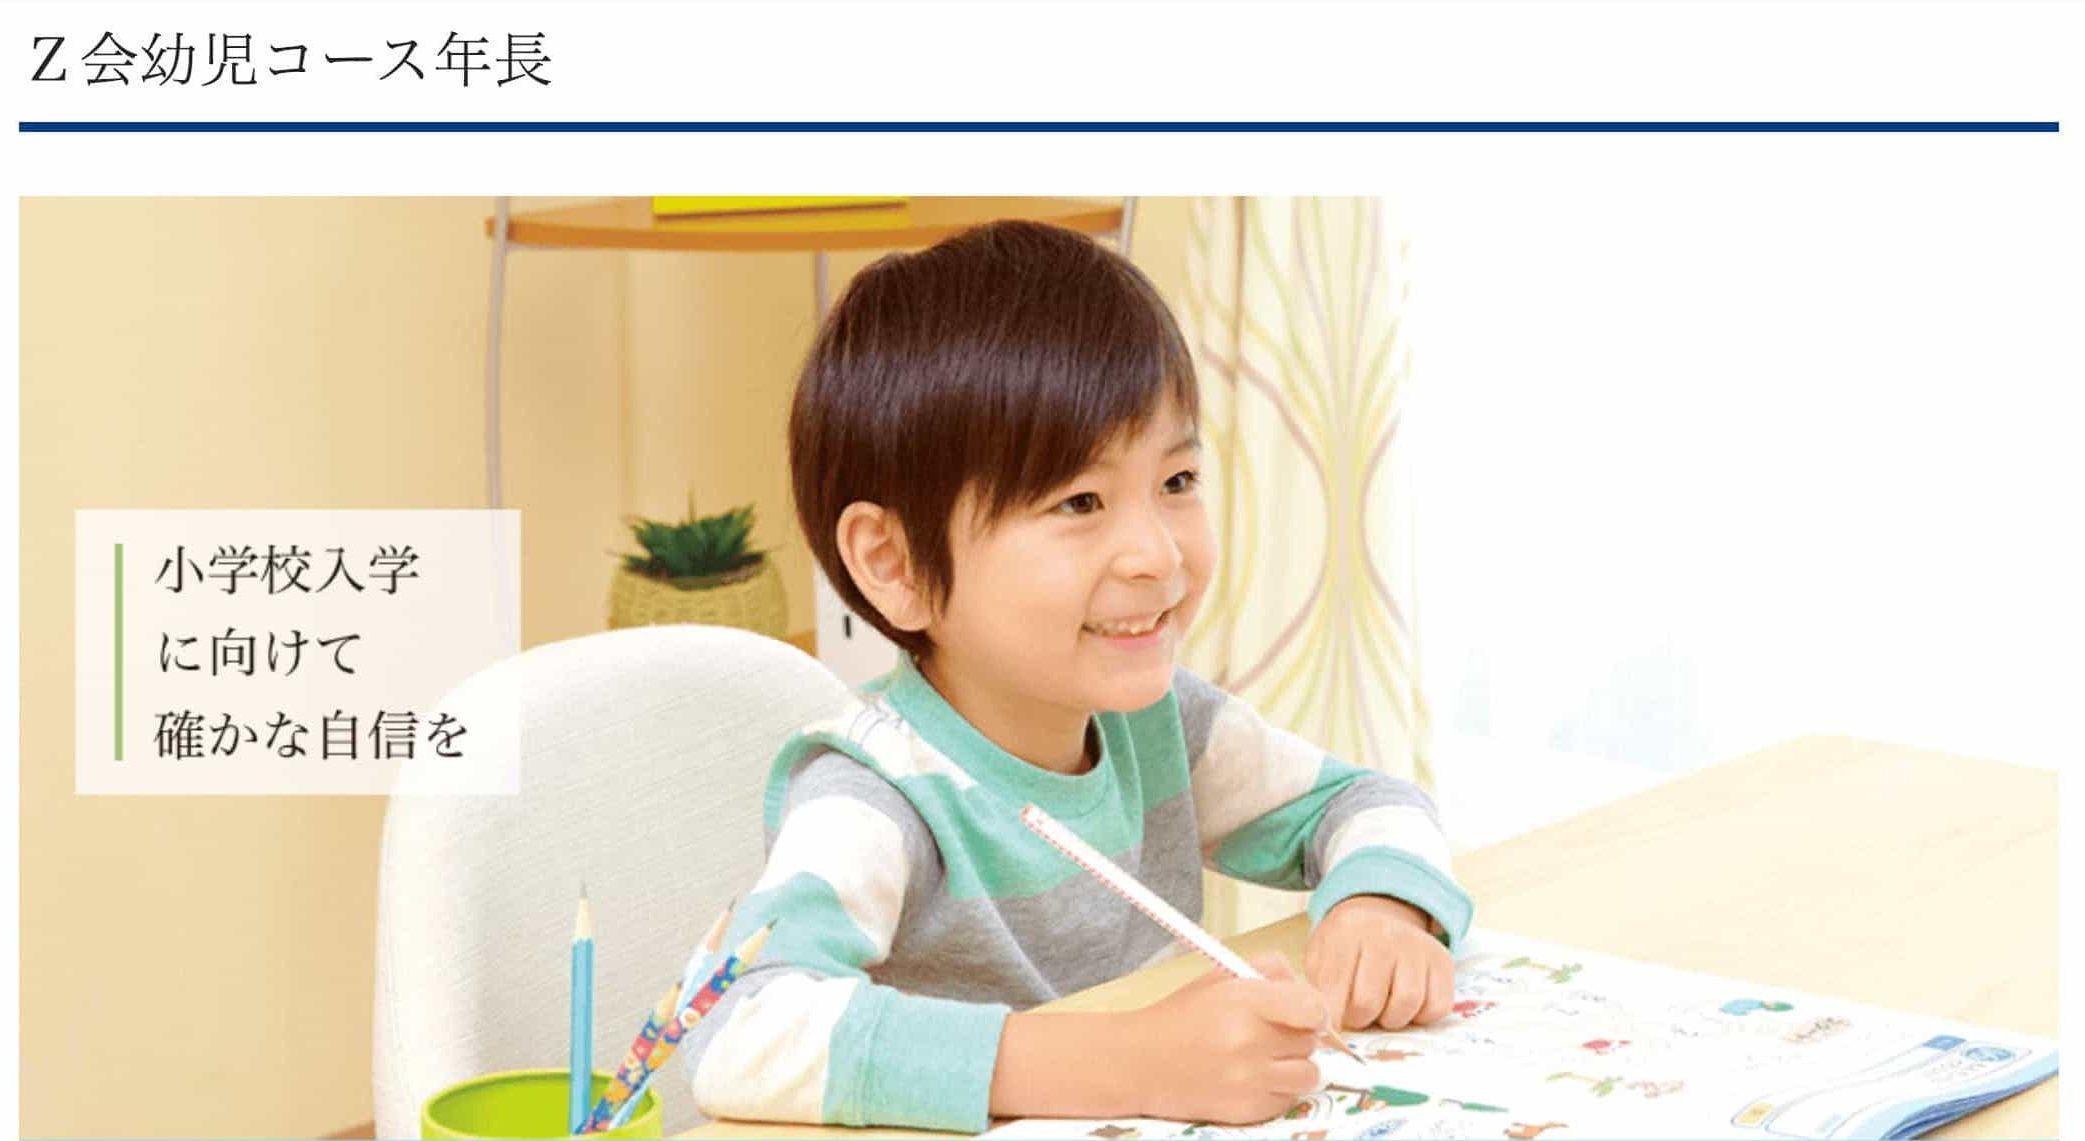 Z会 幼児教育 年長 5歳6歳 TOP -min